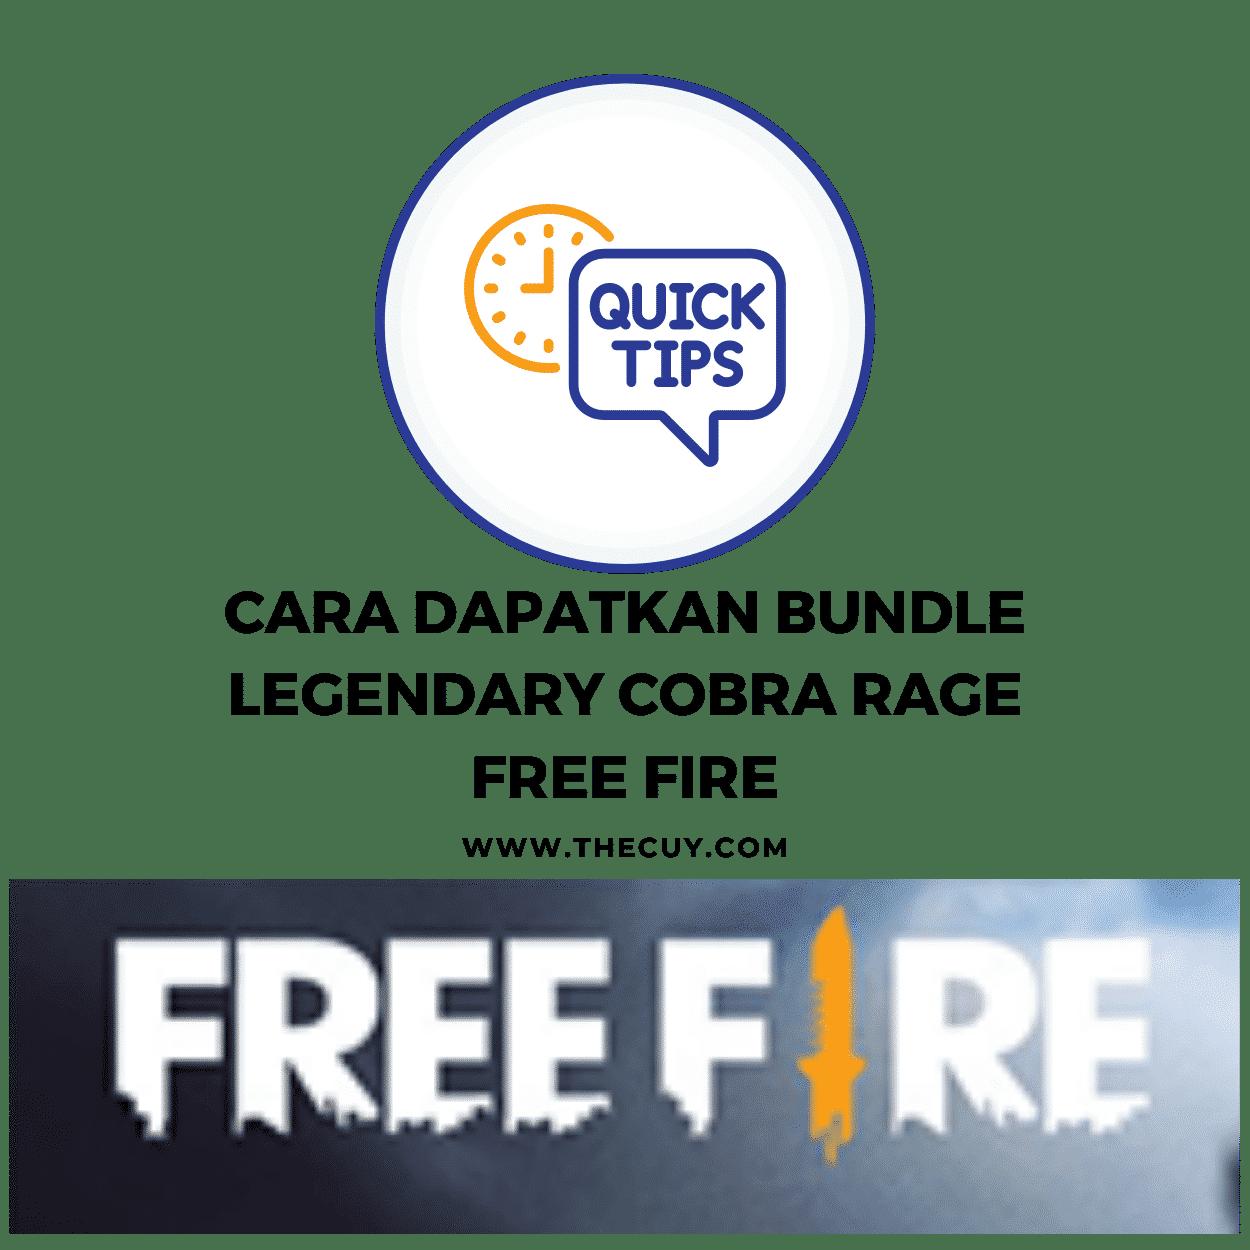 Cara Dapatkan bundle Legendary Cobra Rage Free Fire